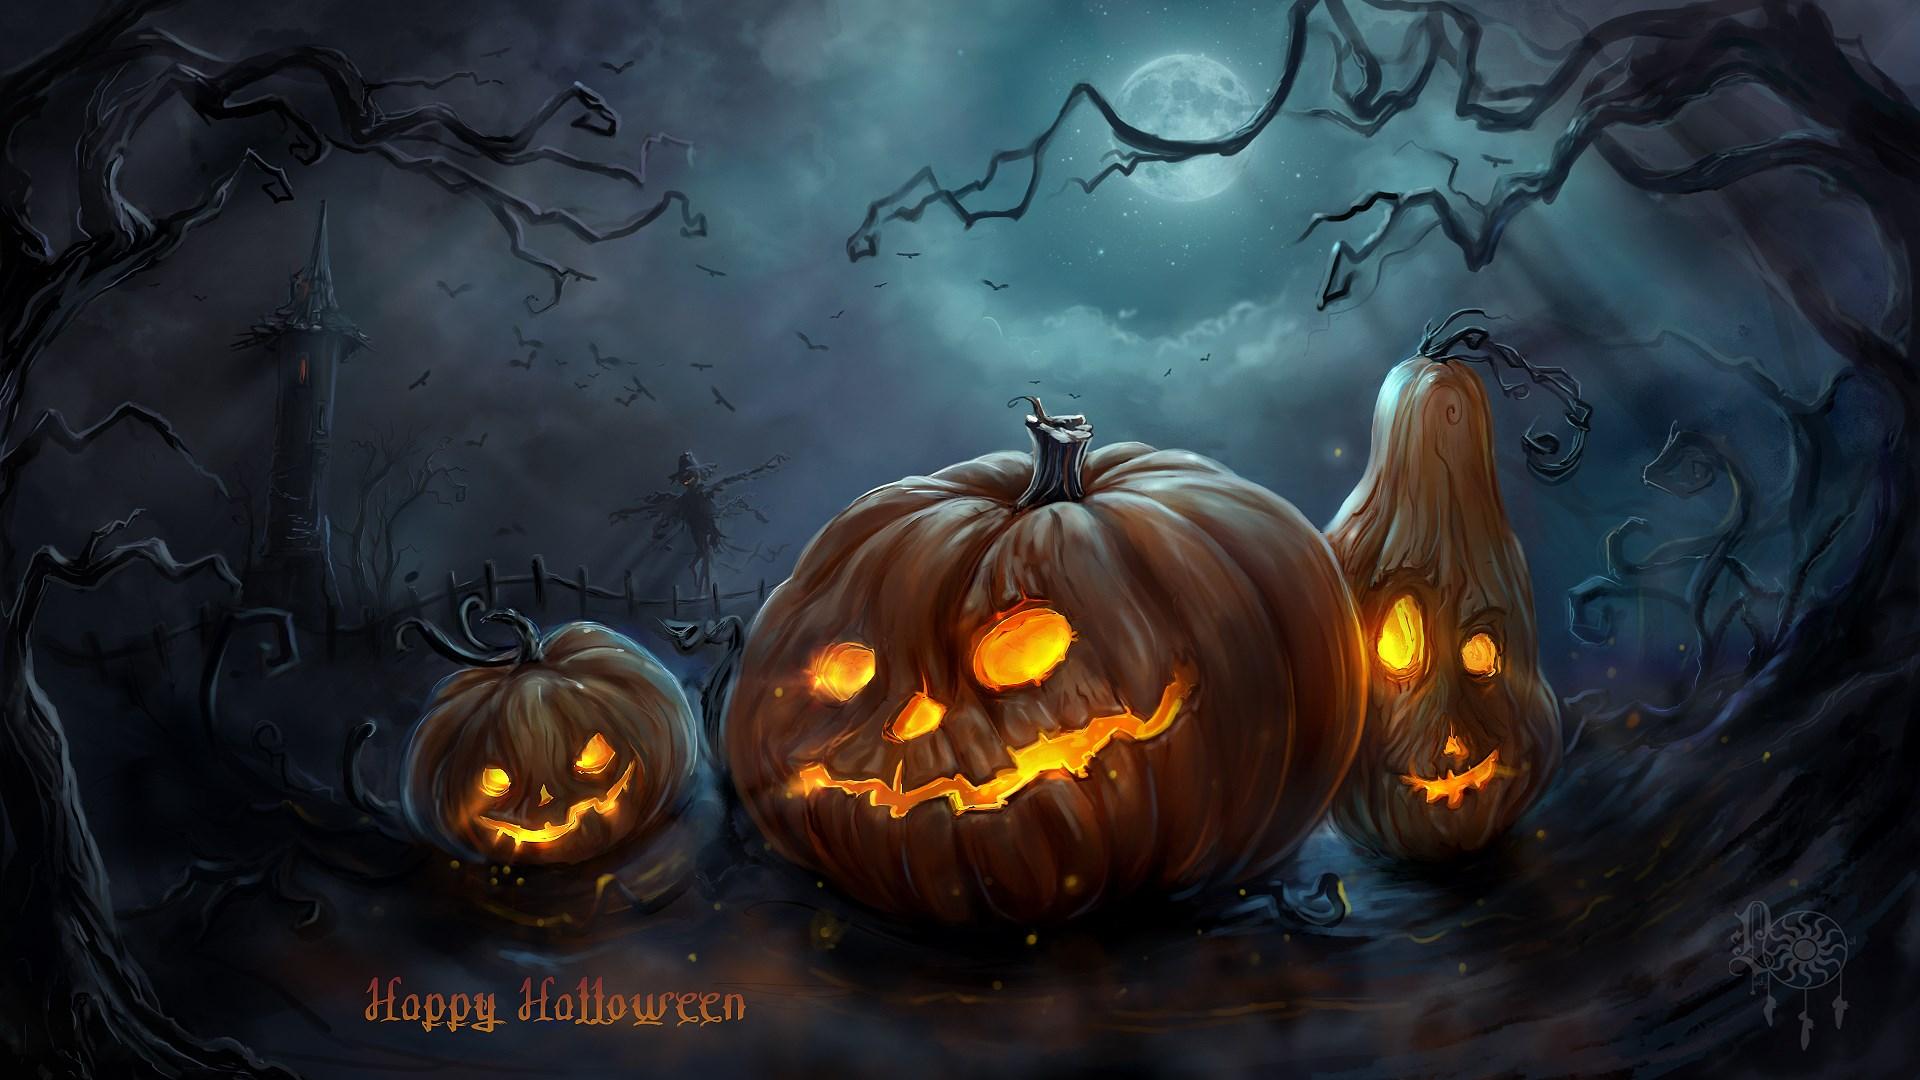 horro-halloween-wallpaper